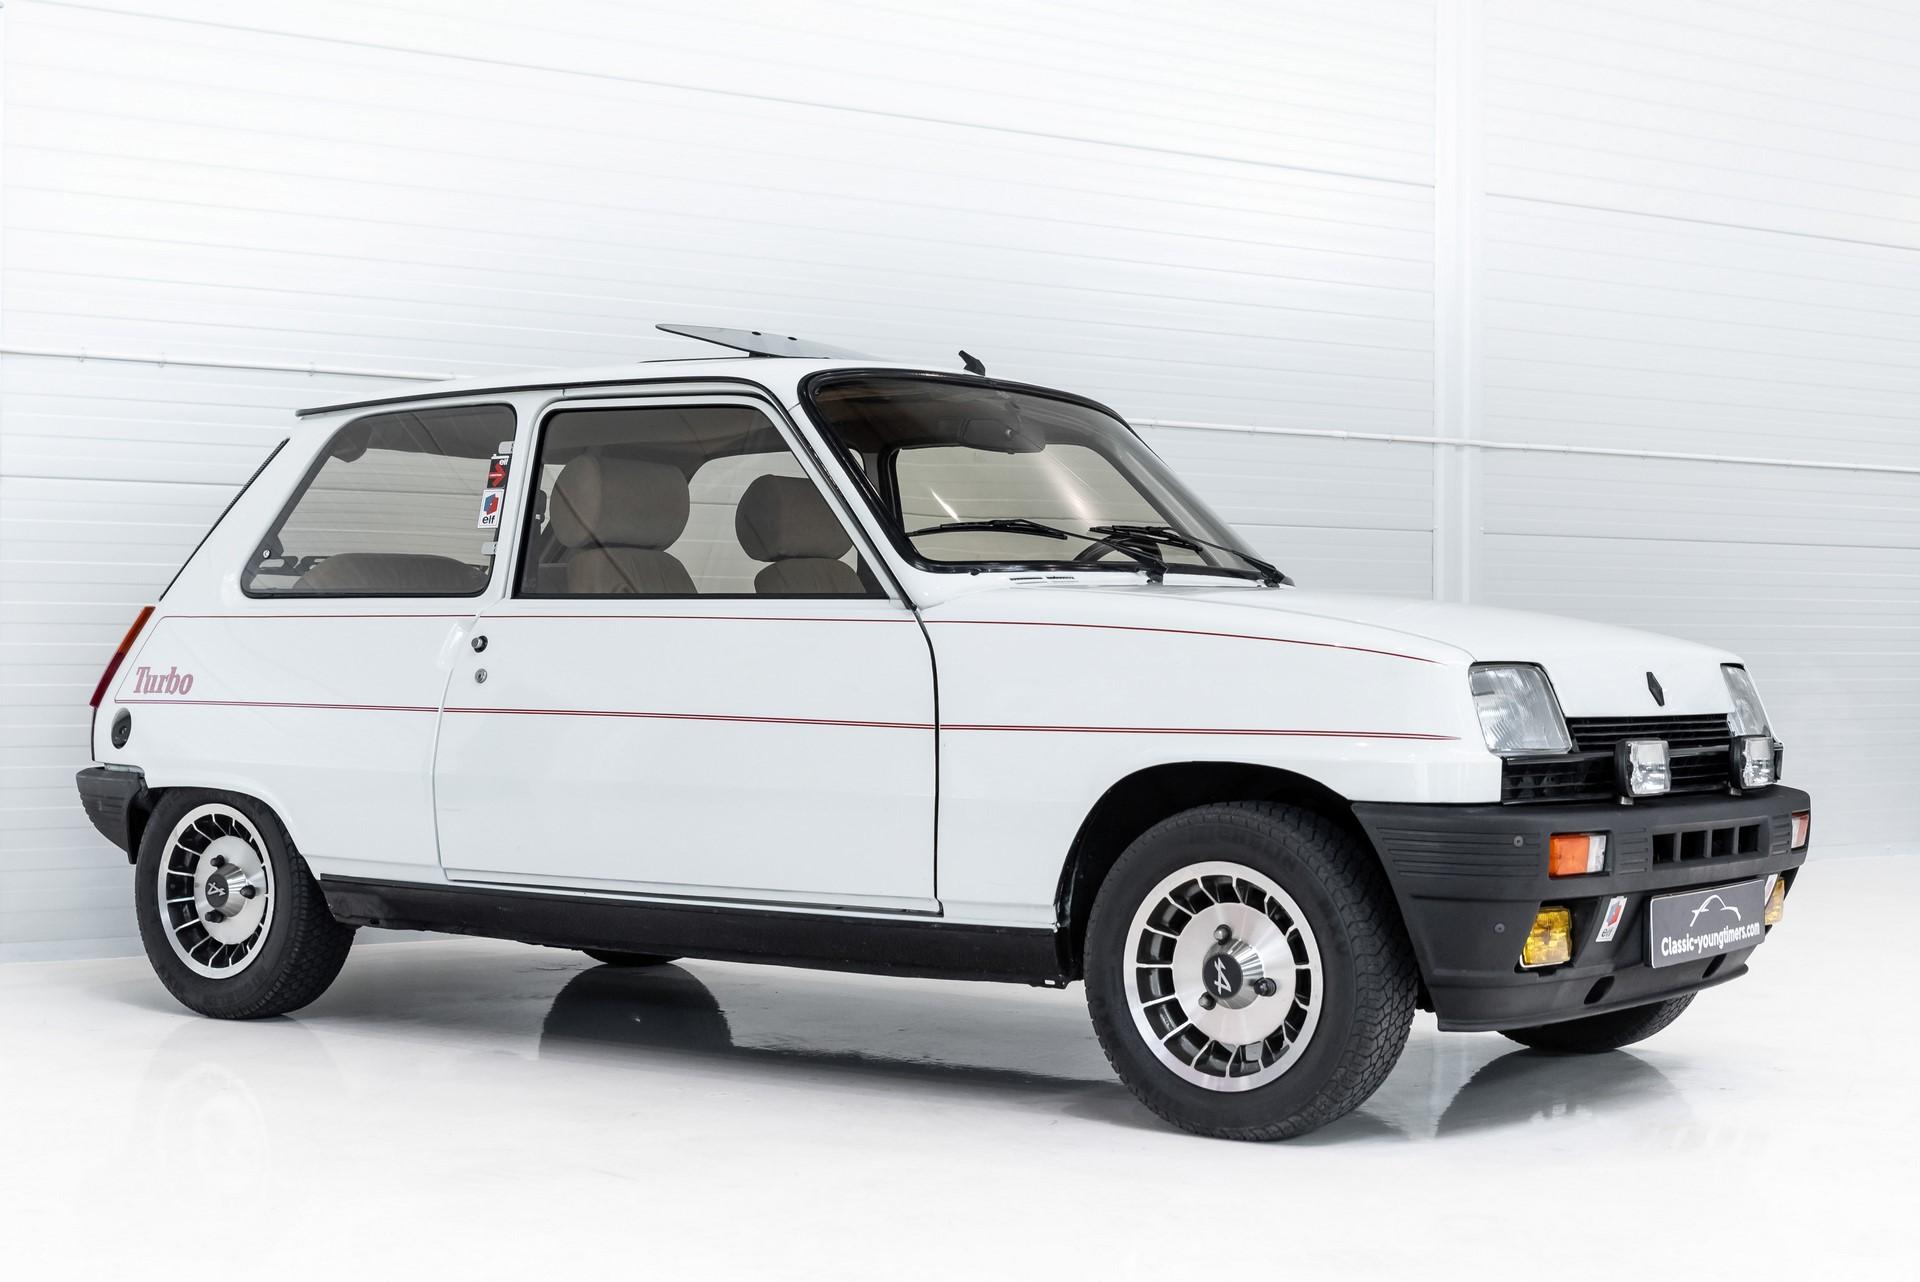 Renault 5 Alpine Turbo (3)